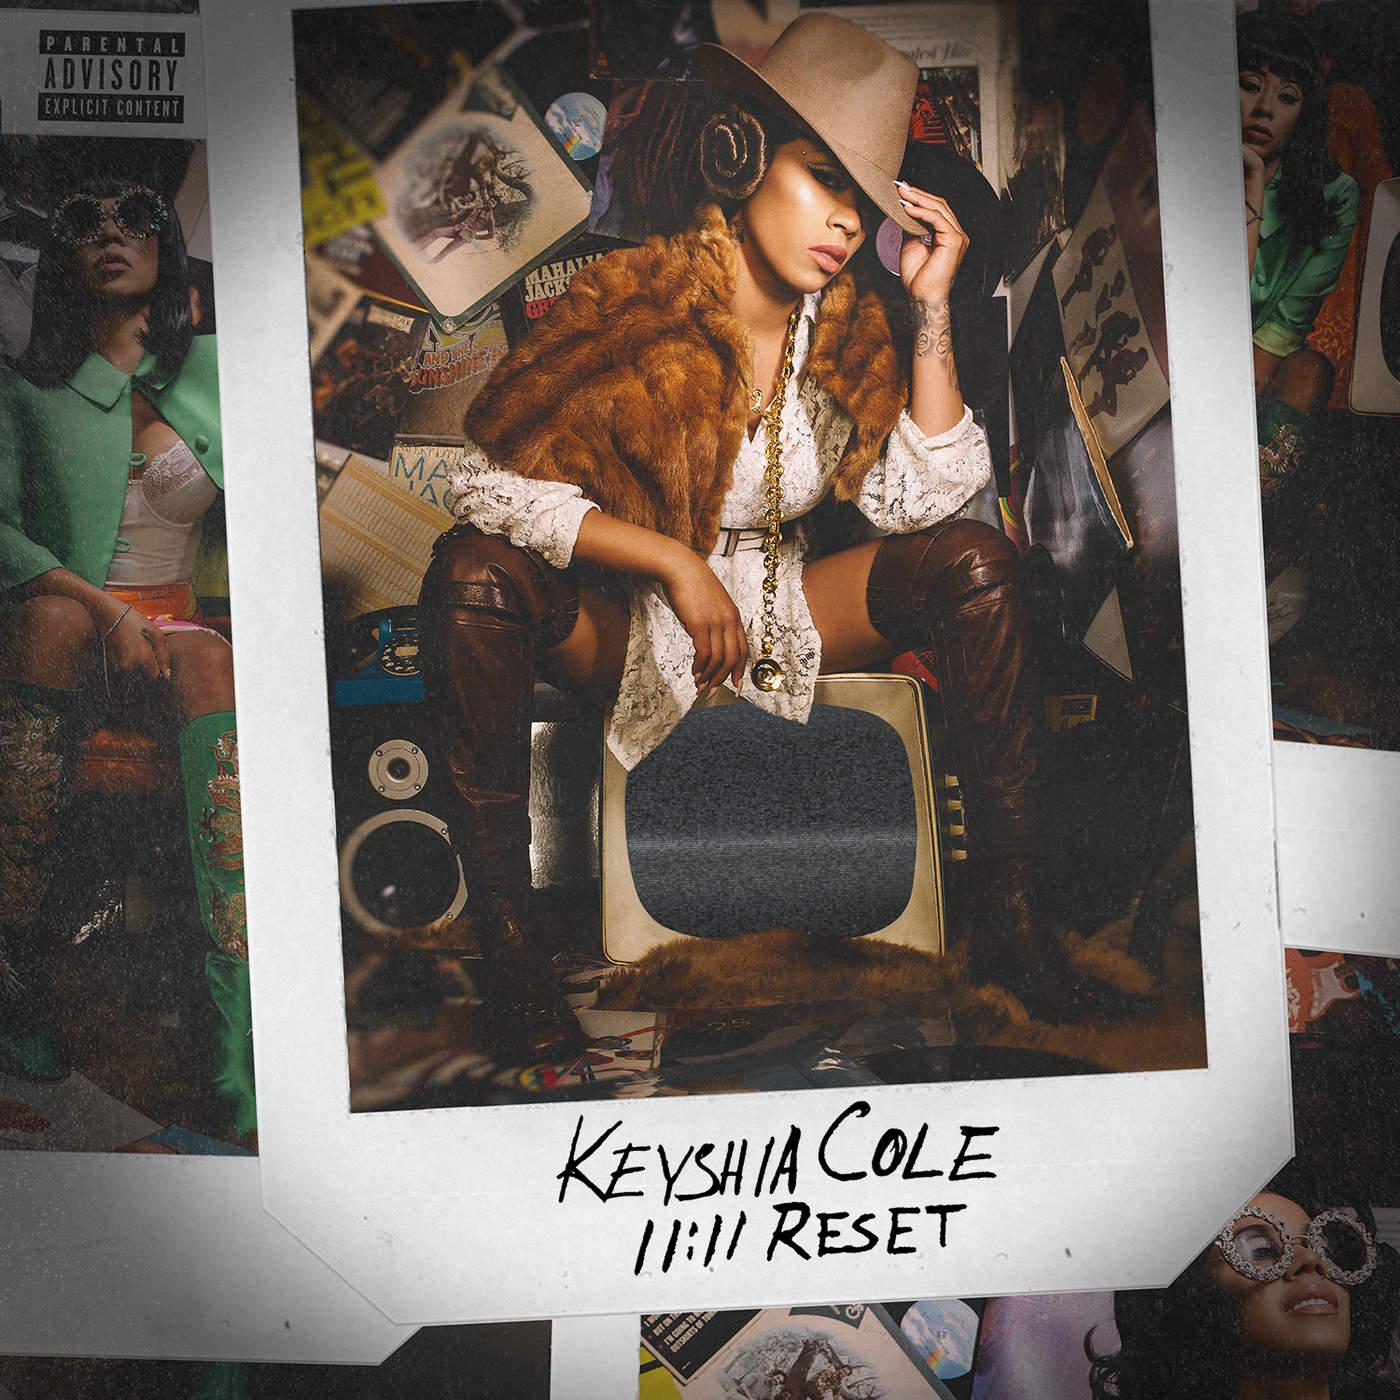 Keyshia Cole – 11:11 Reset [Album Stream]